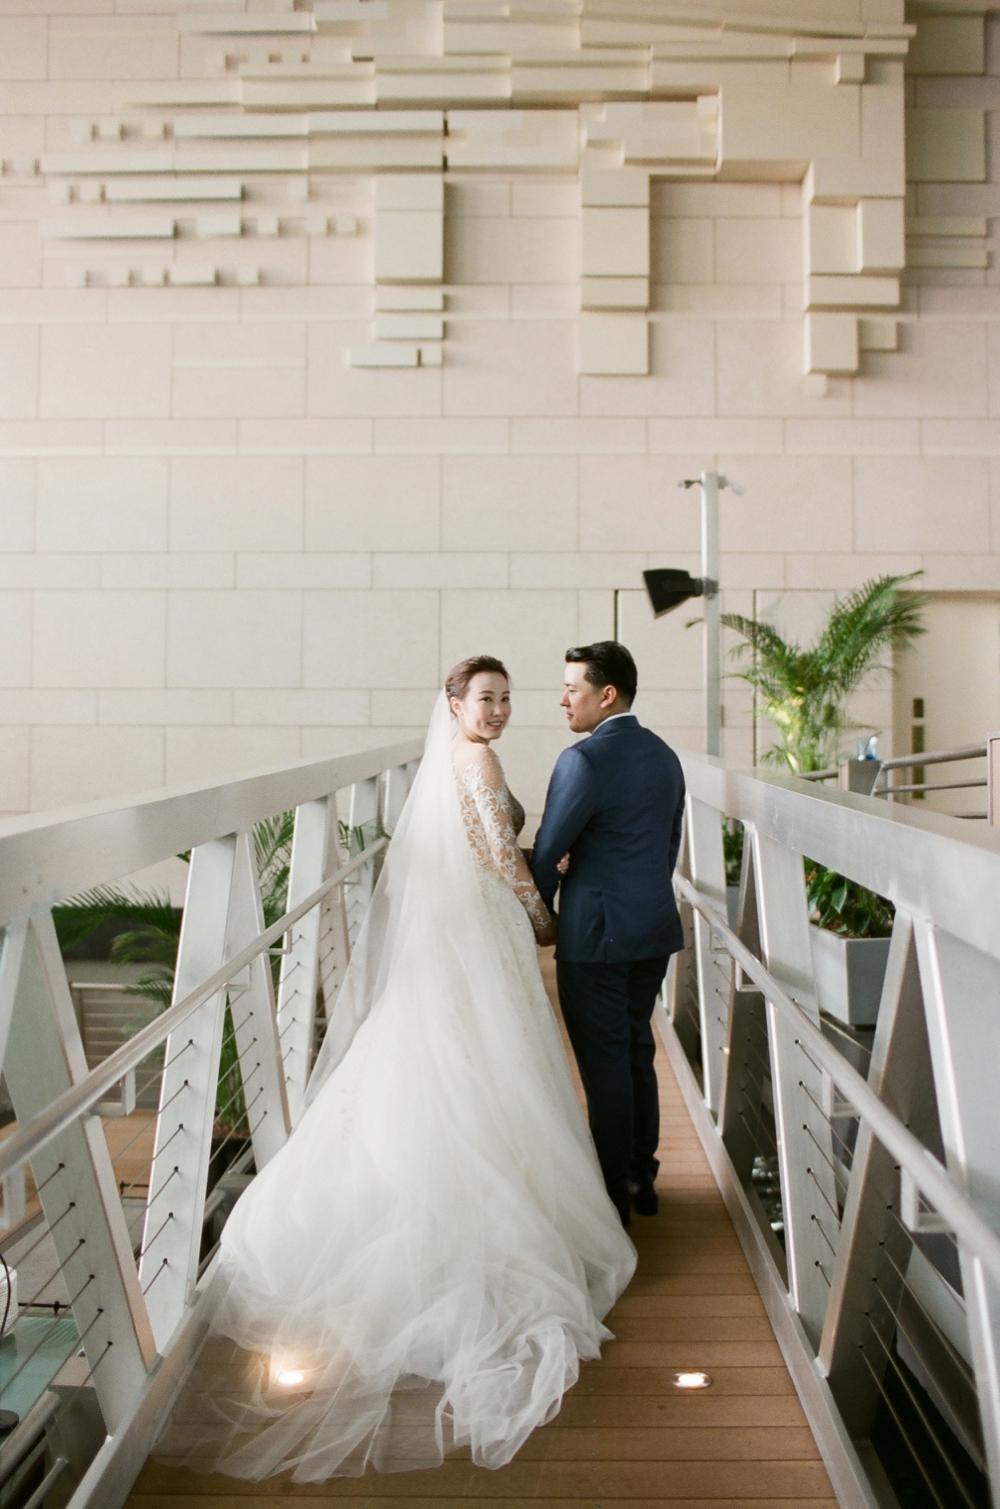 SHISEI + JOEL | SINGAPORE